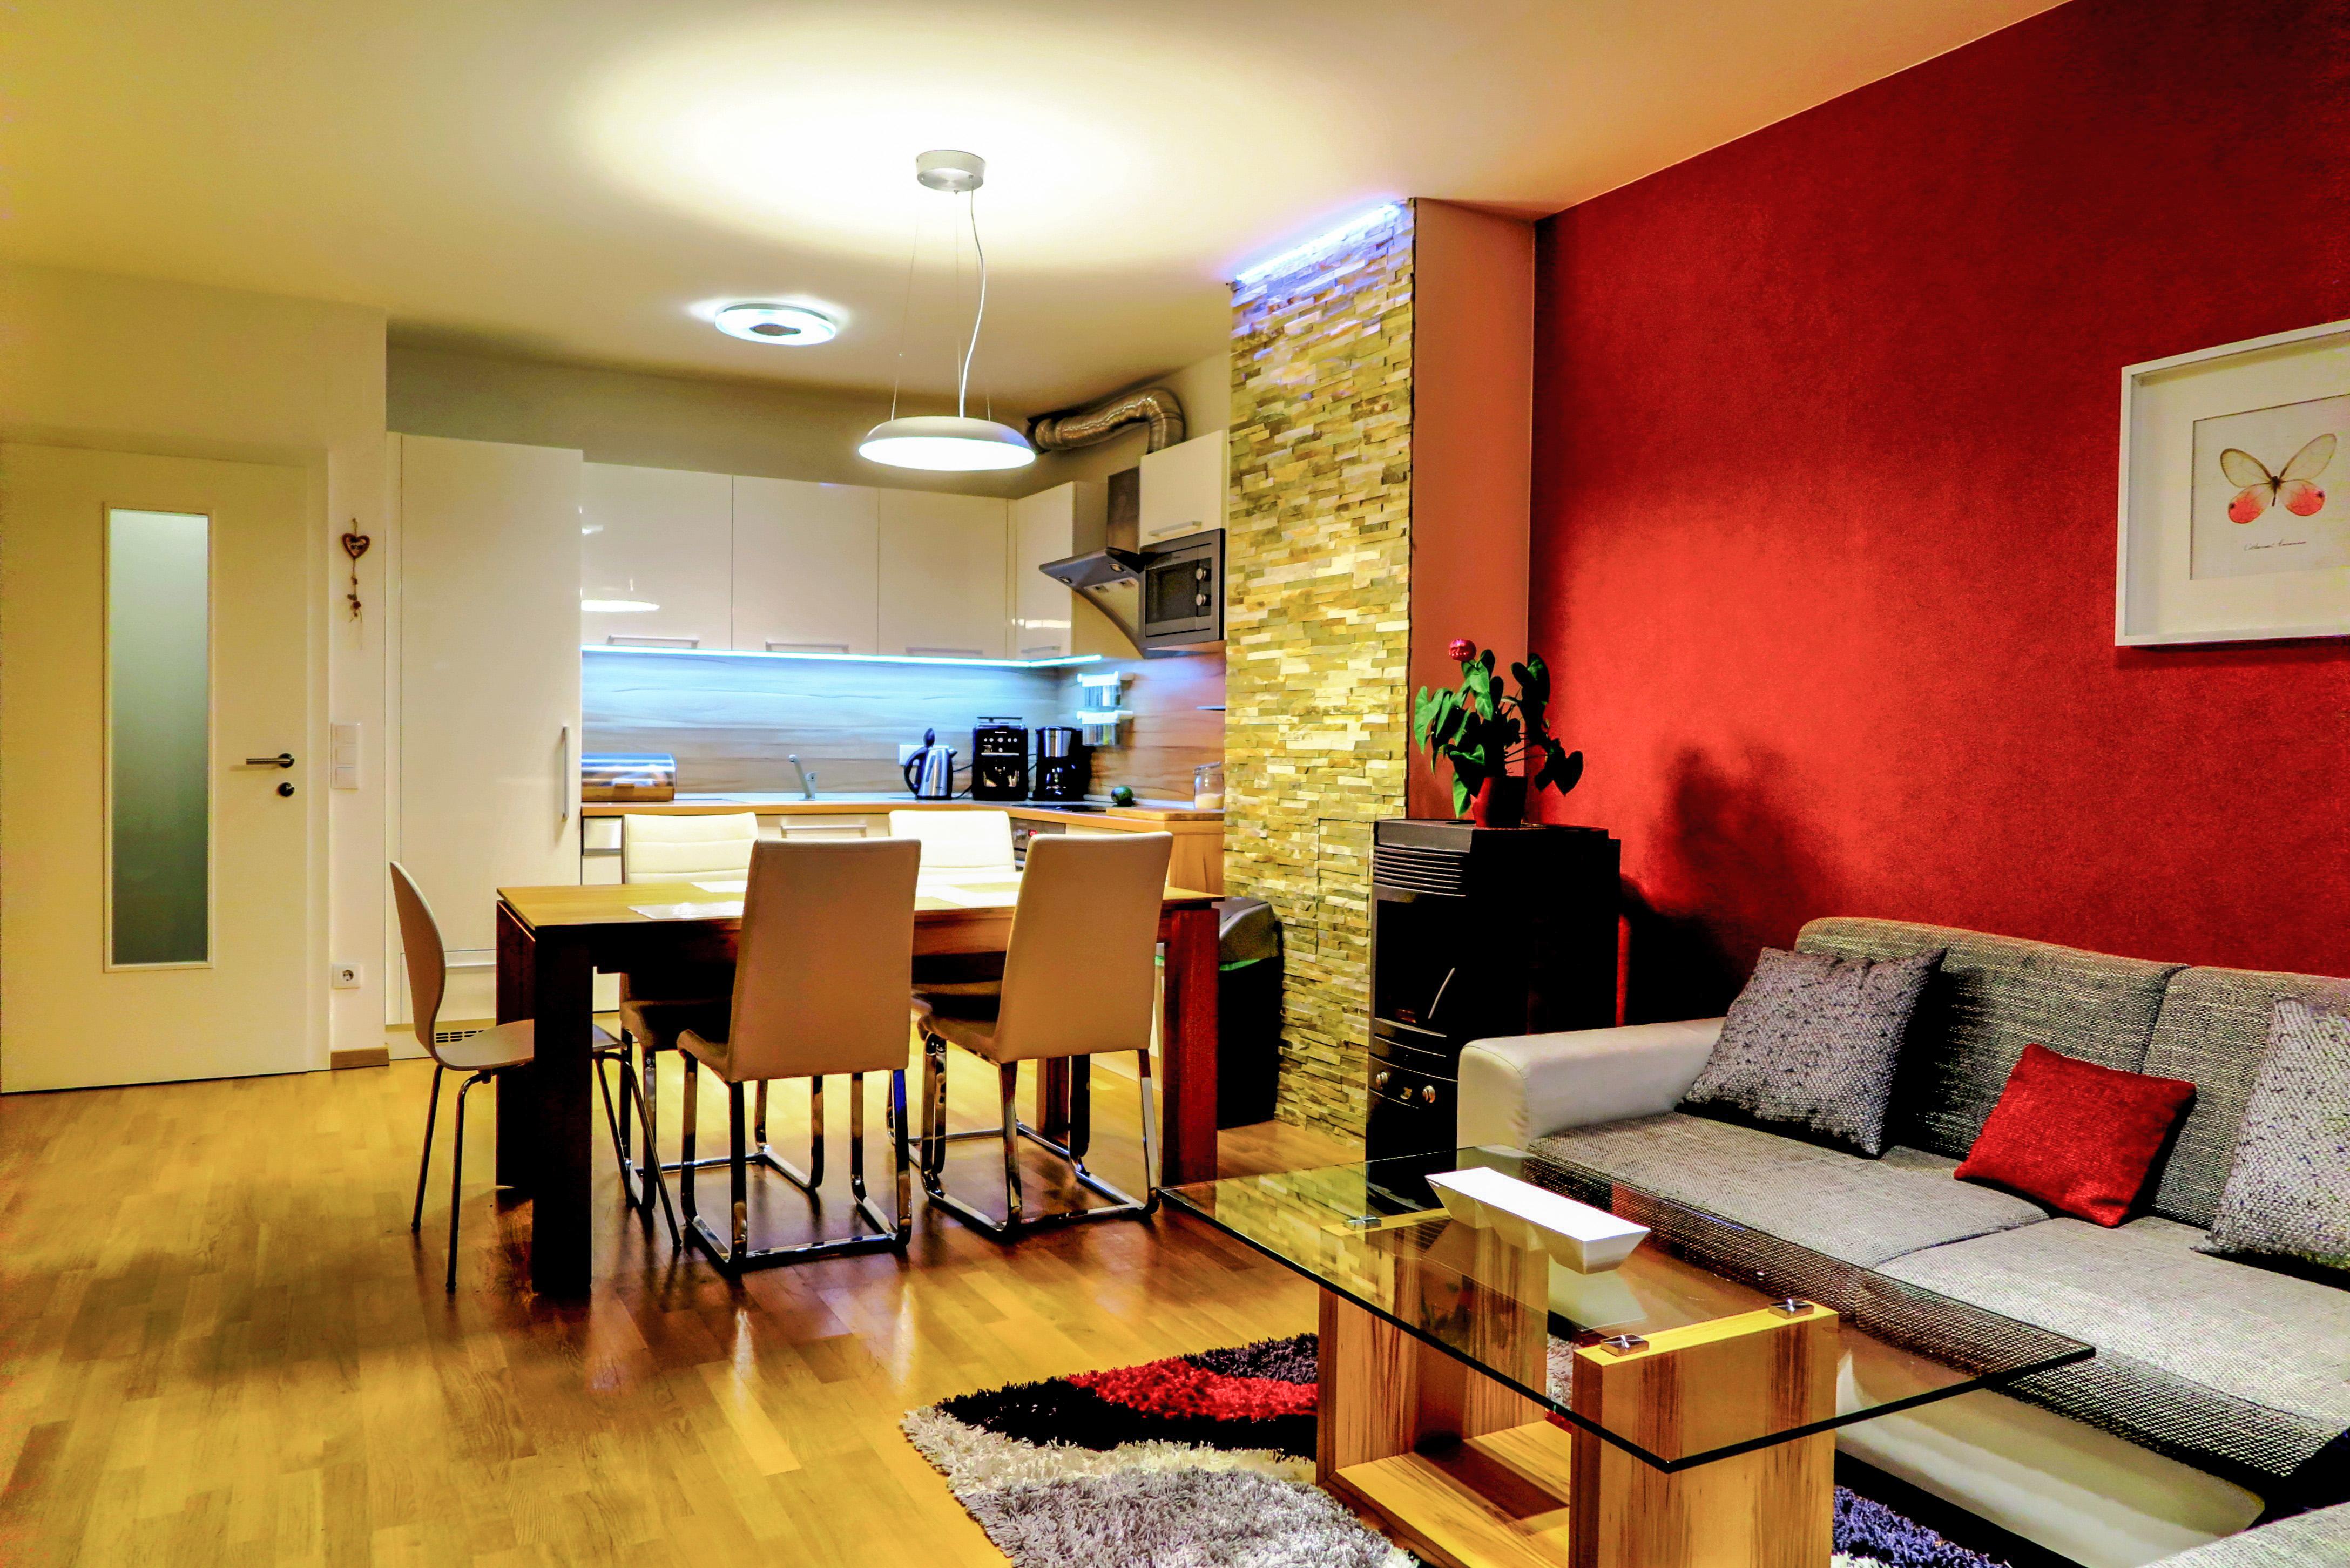 3-izb. apartmán Lux 16